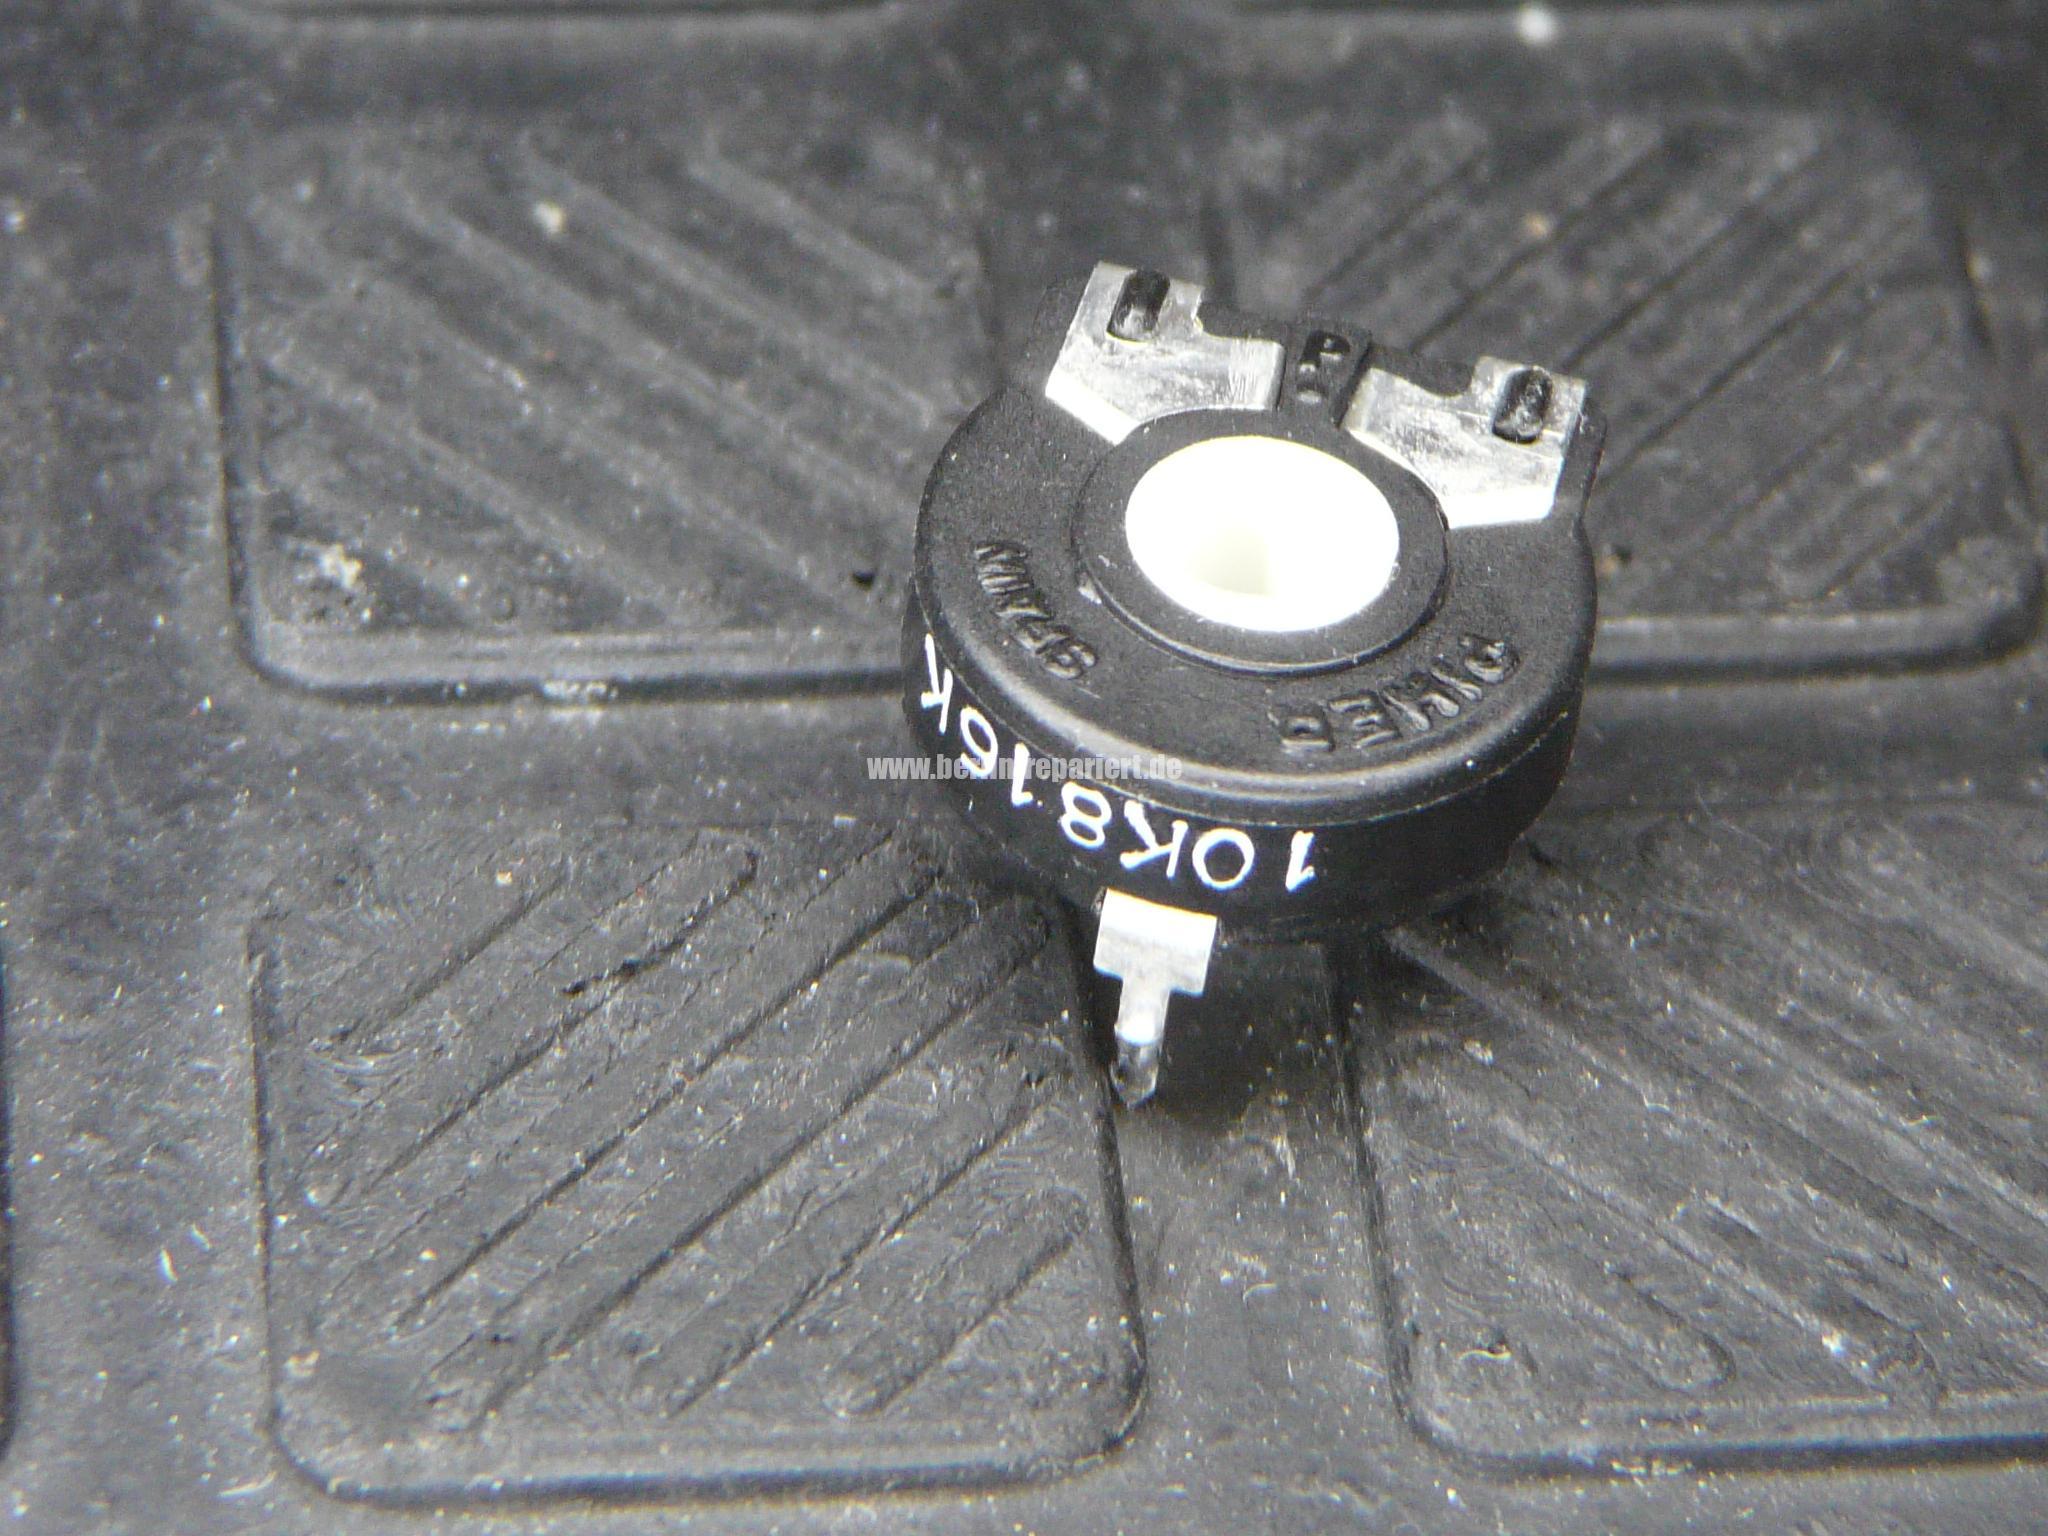 Bosch Kühlschrank Probleme : Bosch kühlschrank friert ein oder kühlt nicht mehr bosch kgs3098